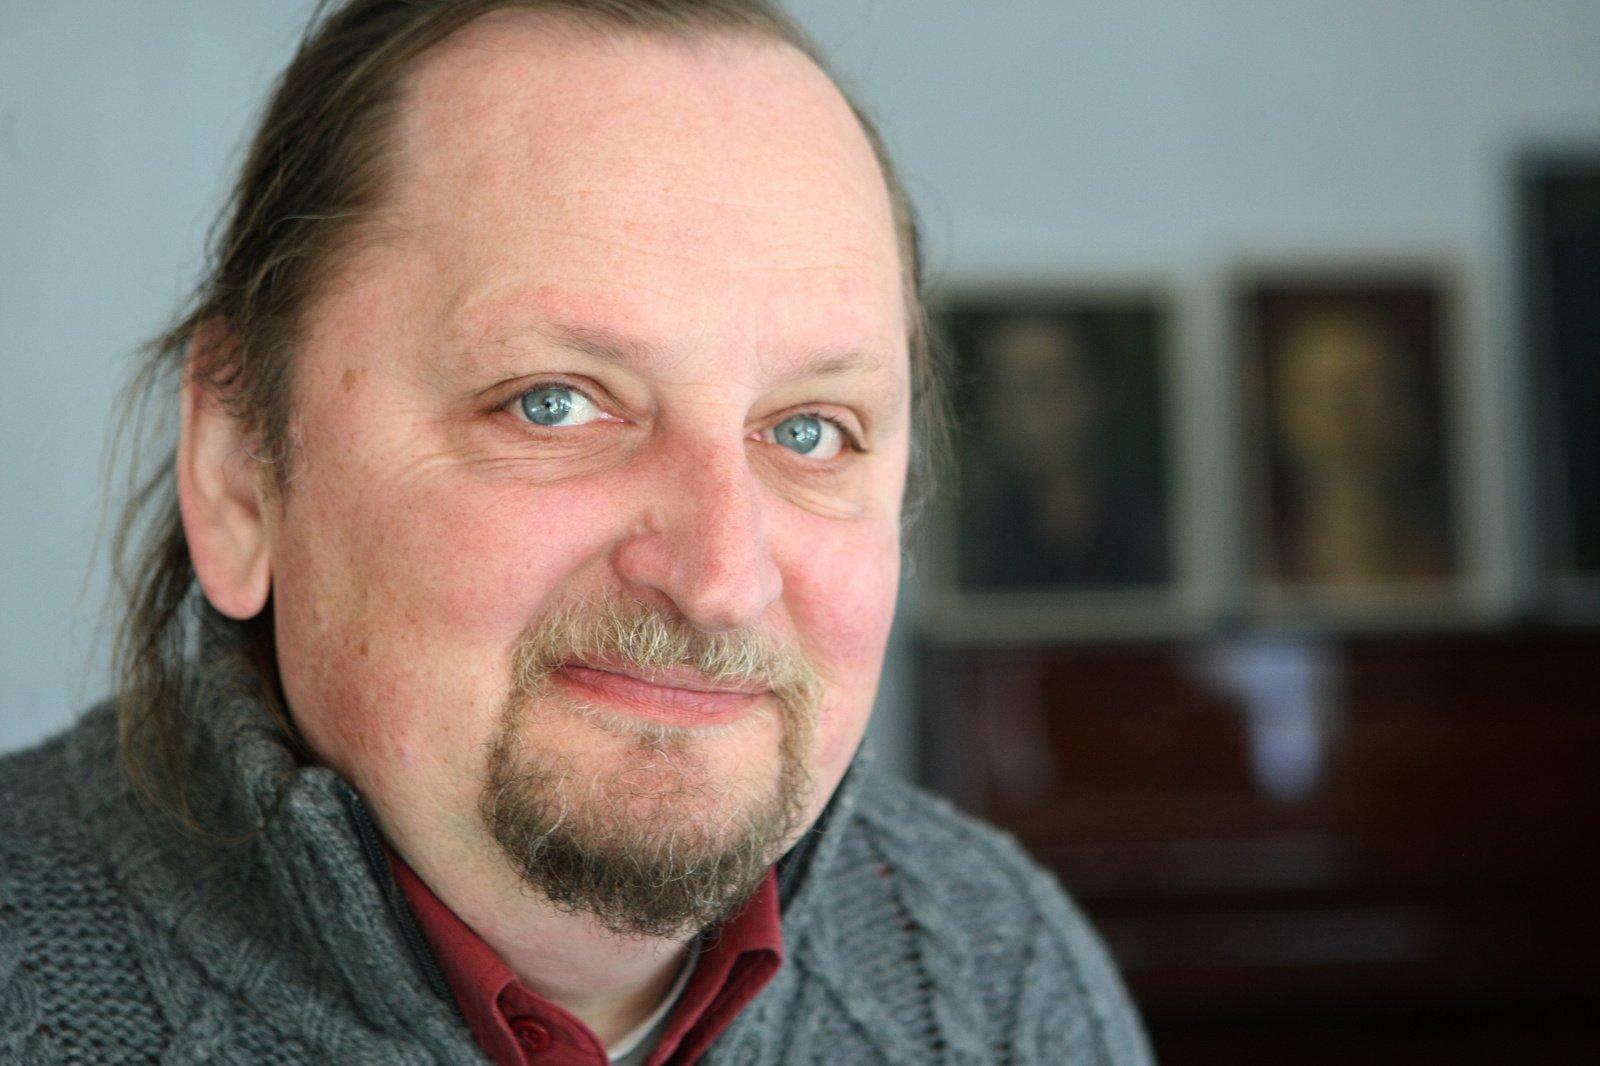 Mirė kompozitorius, muzikologas Algirdas Klova